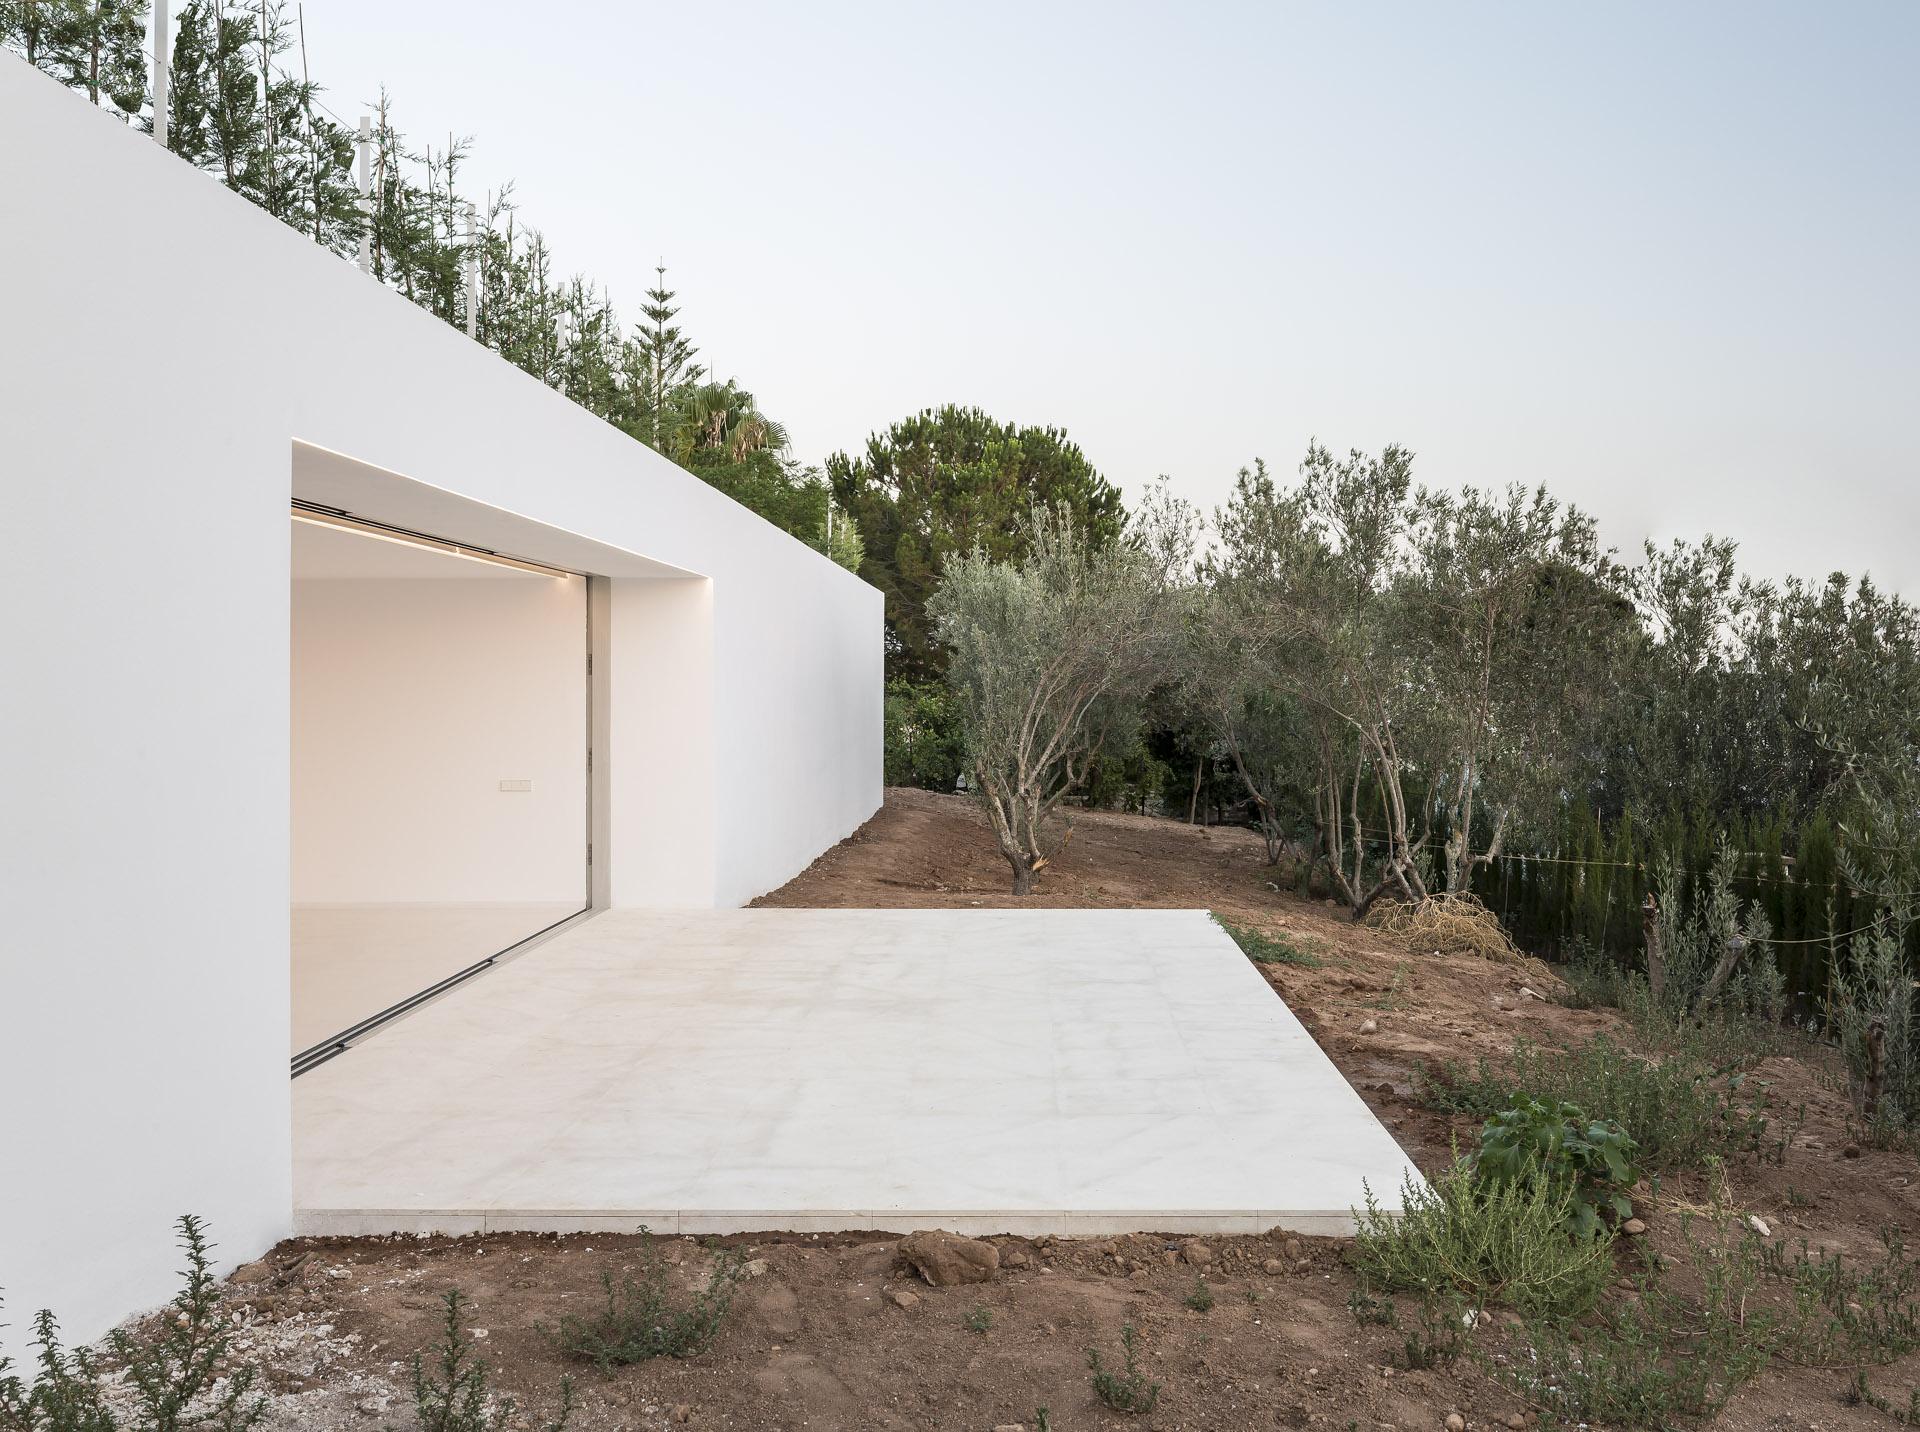 fotografia-arquitectura-valencia-german-cabo-gallardo-llopis-villamarchante-vivienda-53